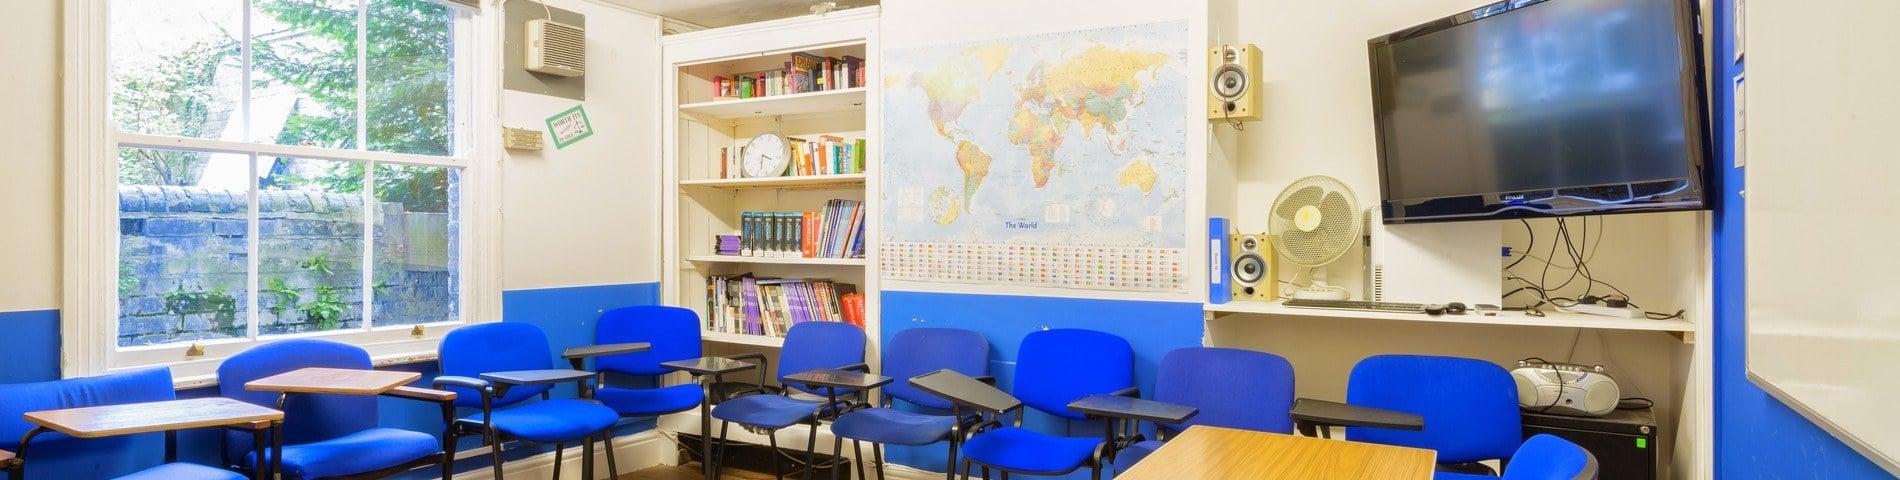 LSI - Language Studies International immagine 1